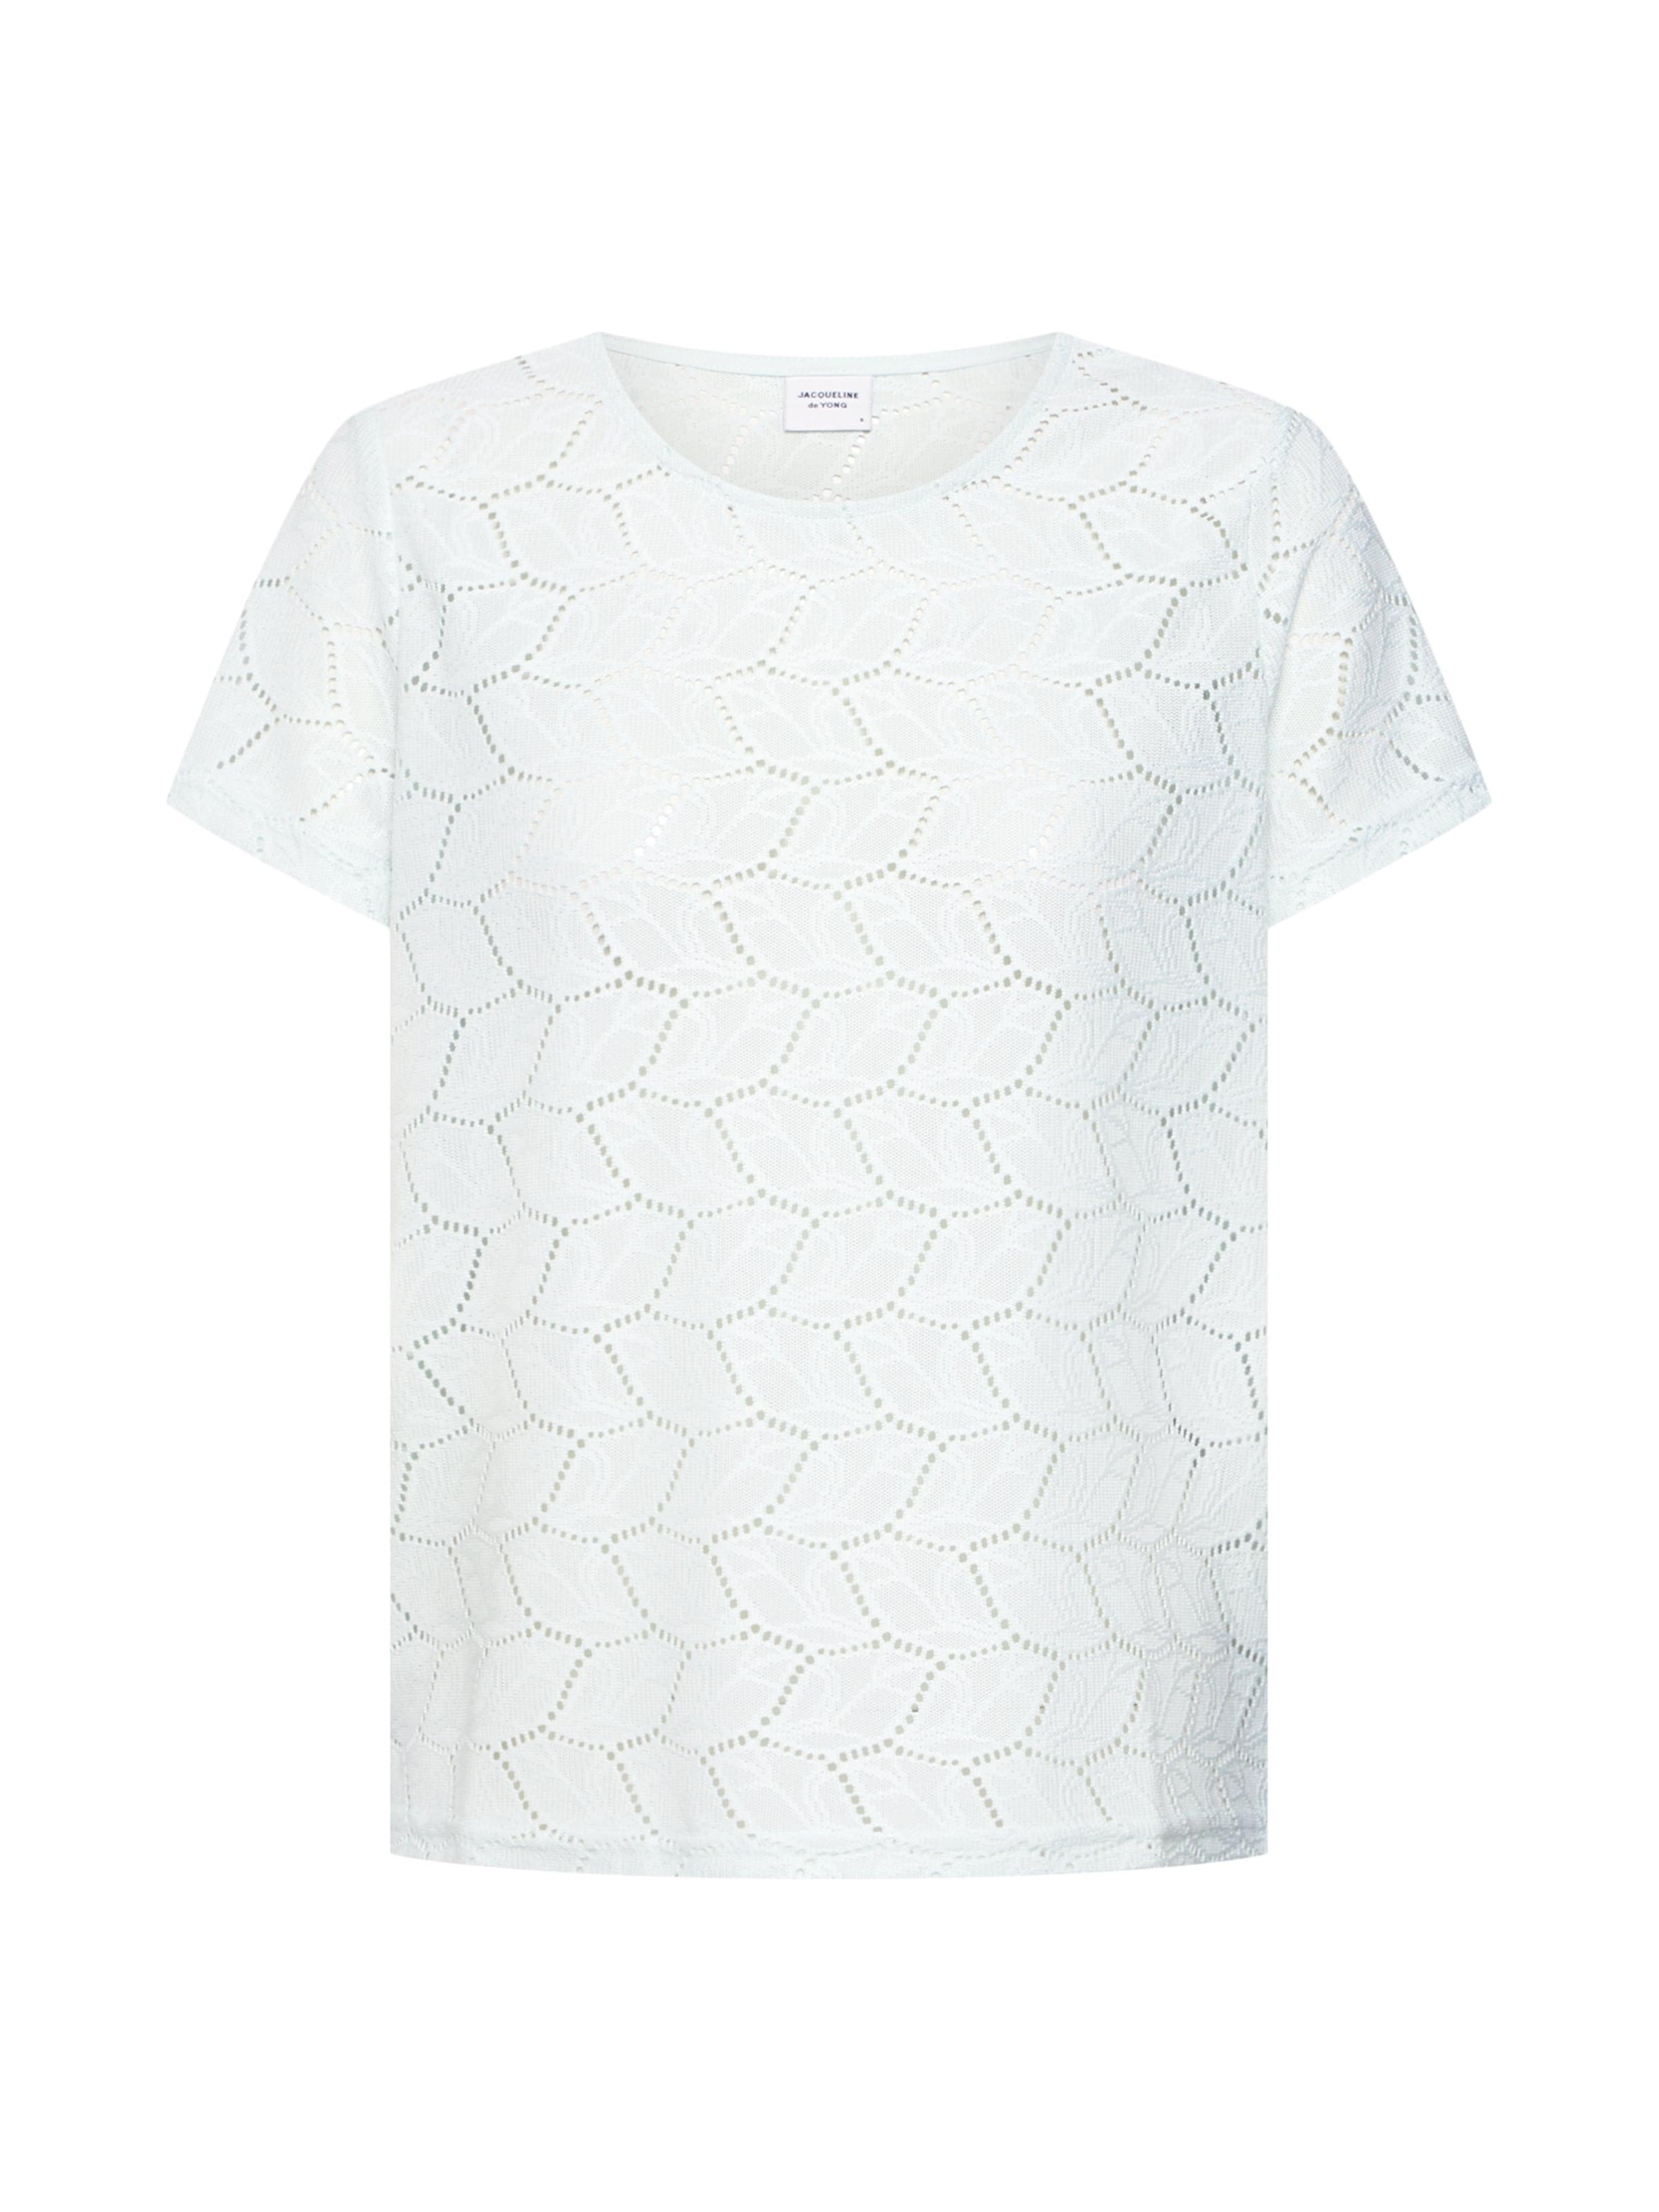 Yong De Verspieltes Shirt In Hellgrün Jacqueline n0mOvN8w